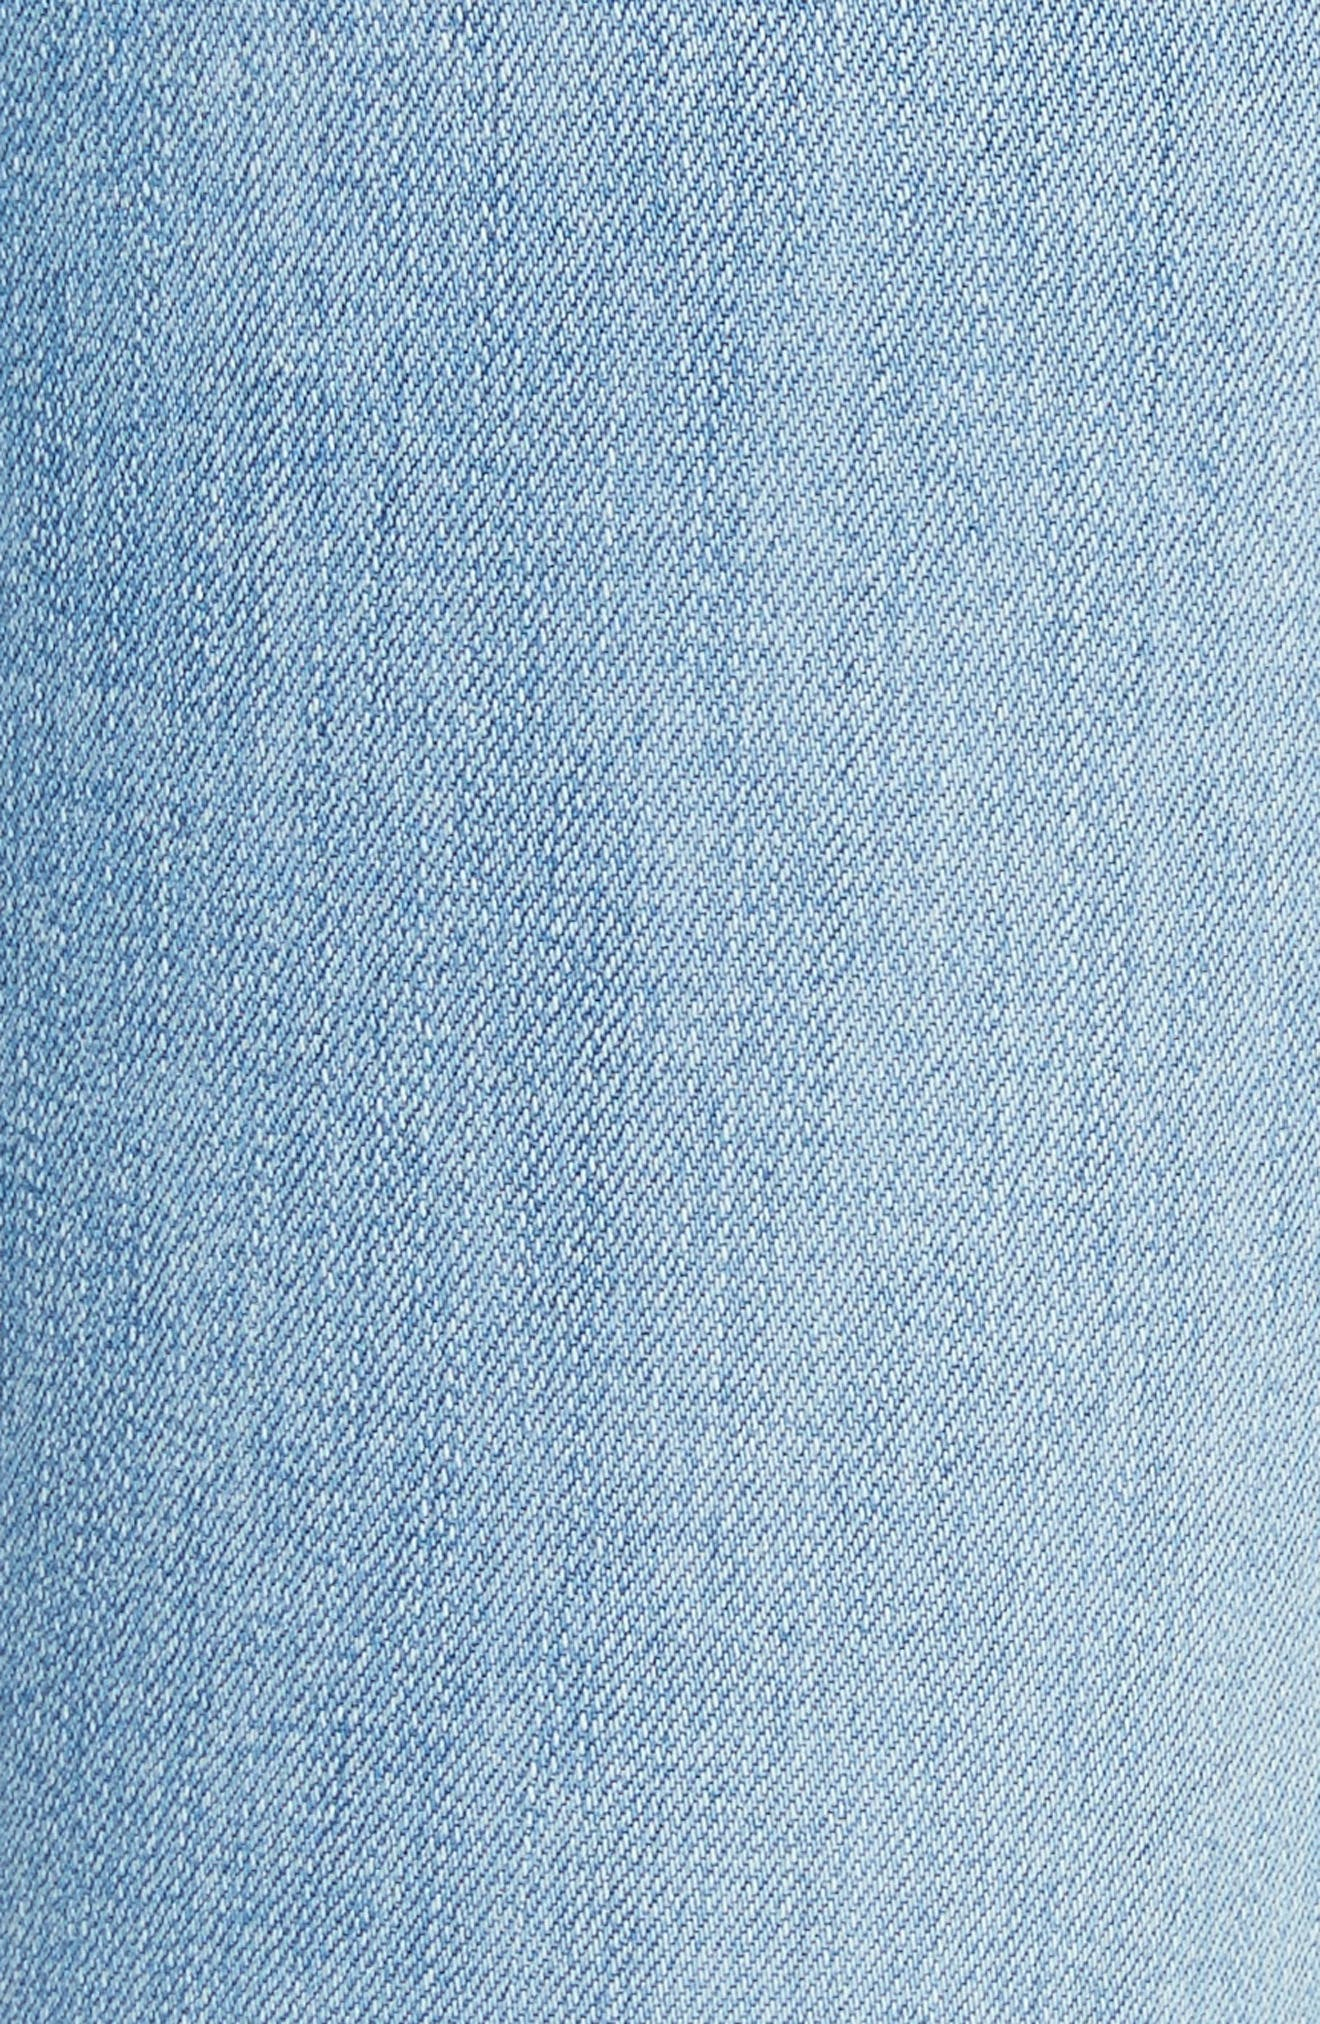 W4 Colette Crop Skinny Jeans,                             Alternate thumbnail 5, color,                             Carlo